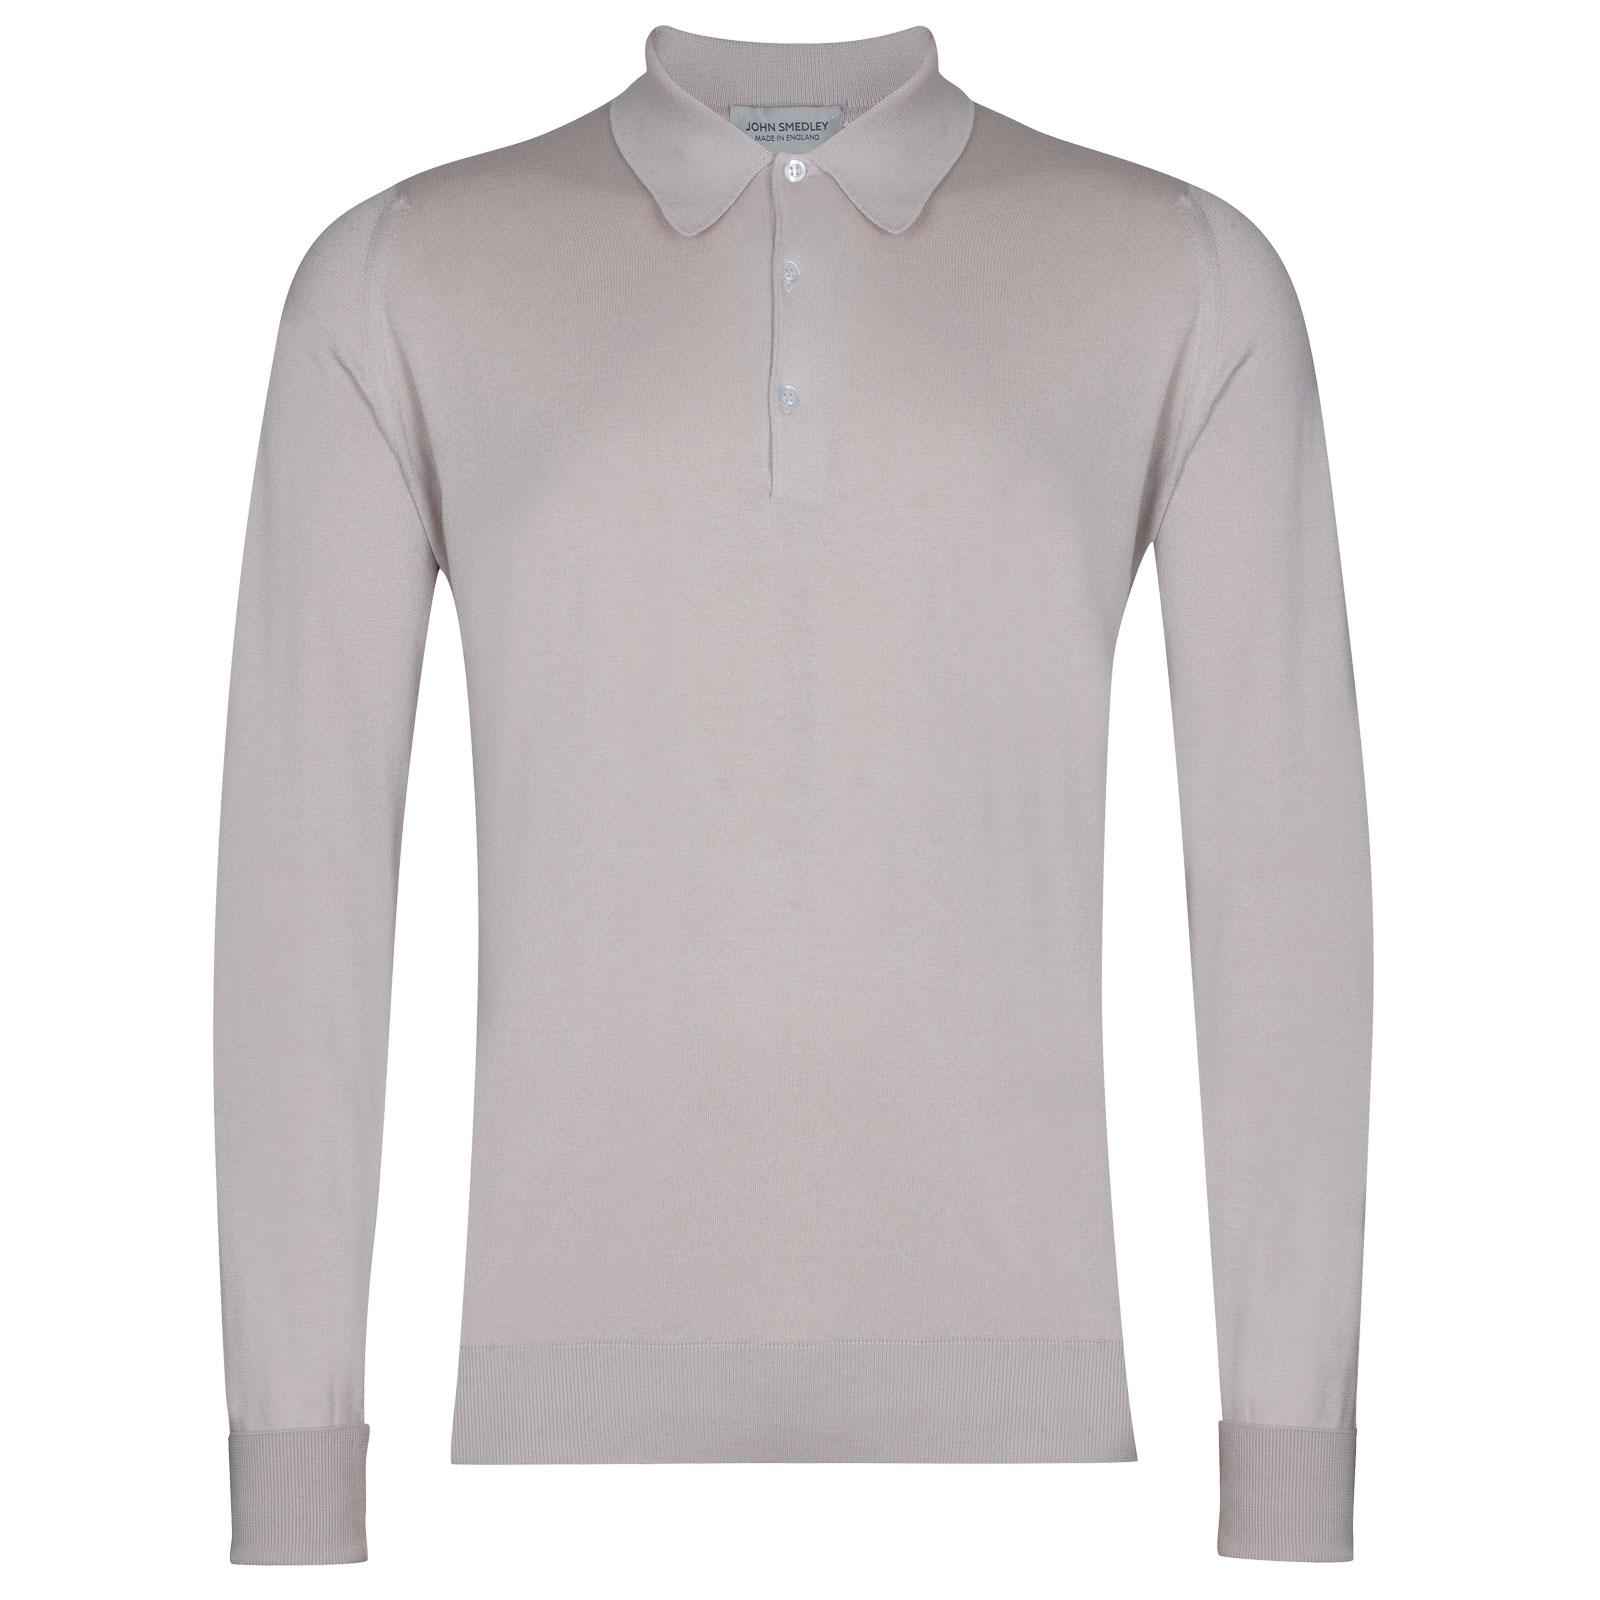 John Smedley Finchley in Brunel Beige Shirt-XLG